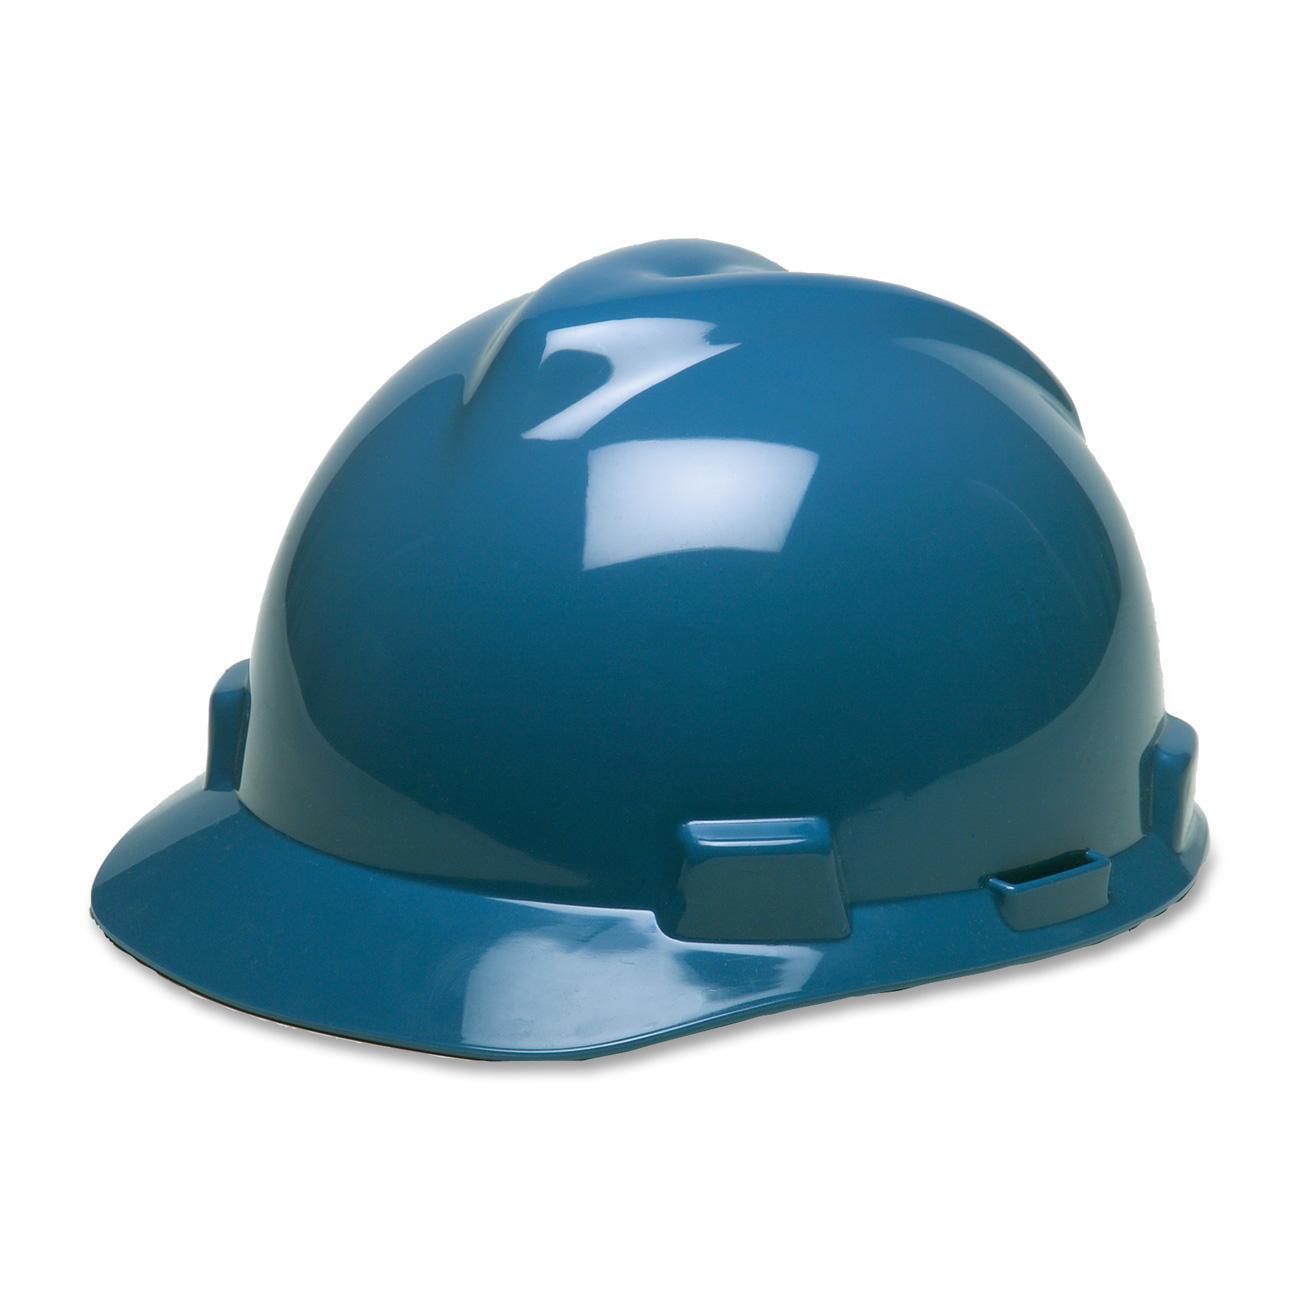 MSA, MSA475359, V-Gard Fas Trac Suspension Safety Cap, 1 Each, Blue